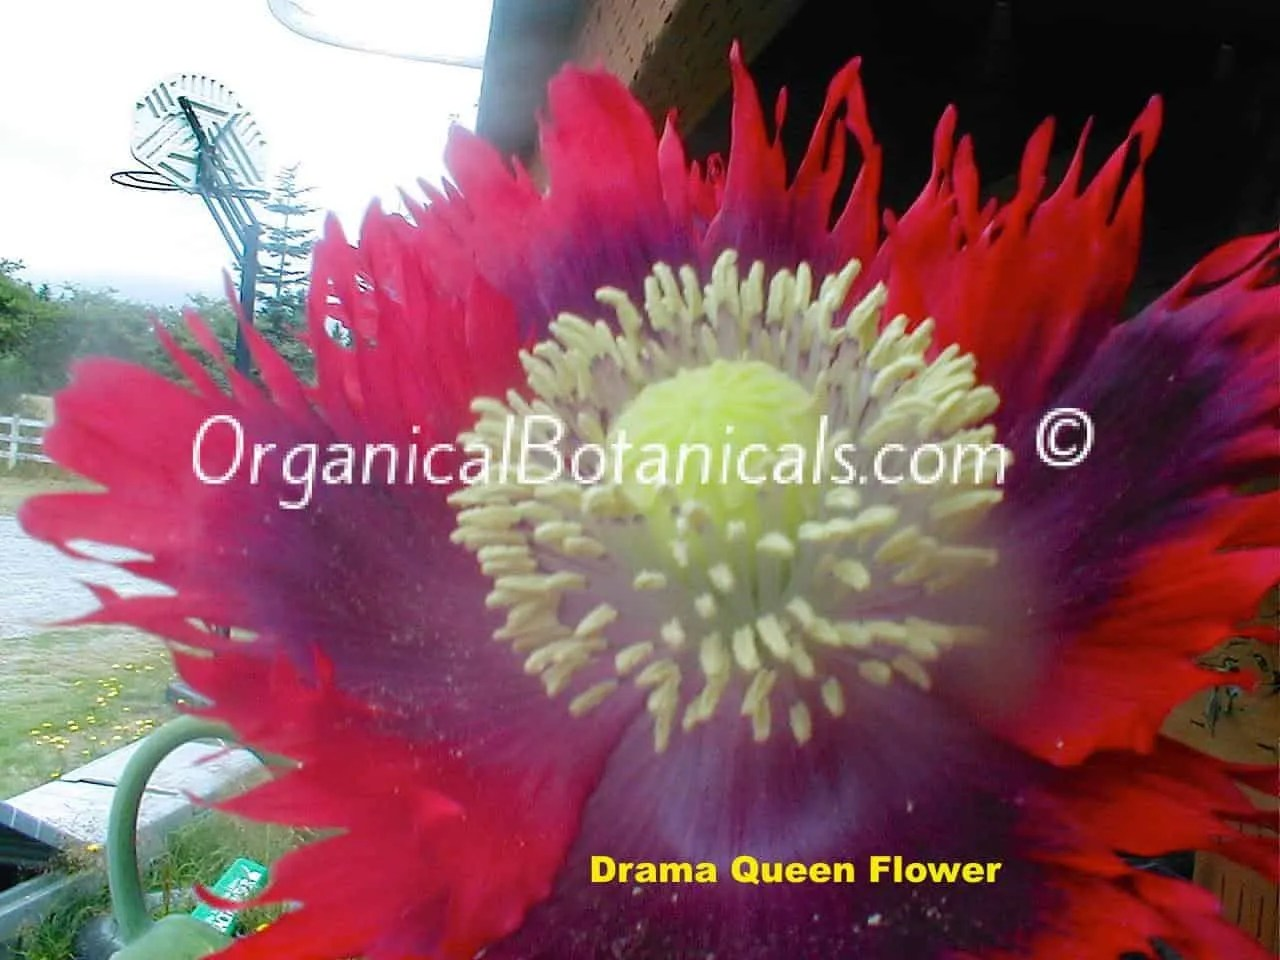 Somniferum Exotic Mix Top Shelf Quality Poppy Seeds Organical